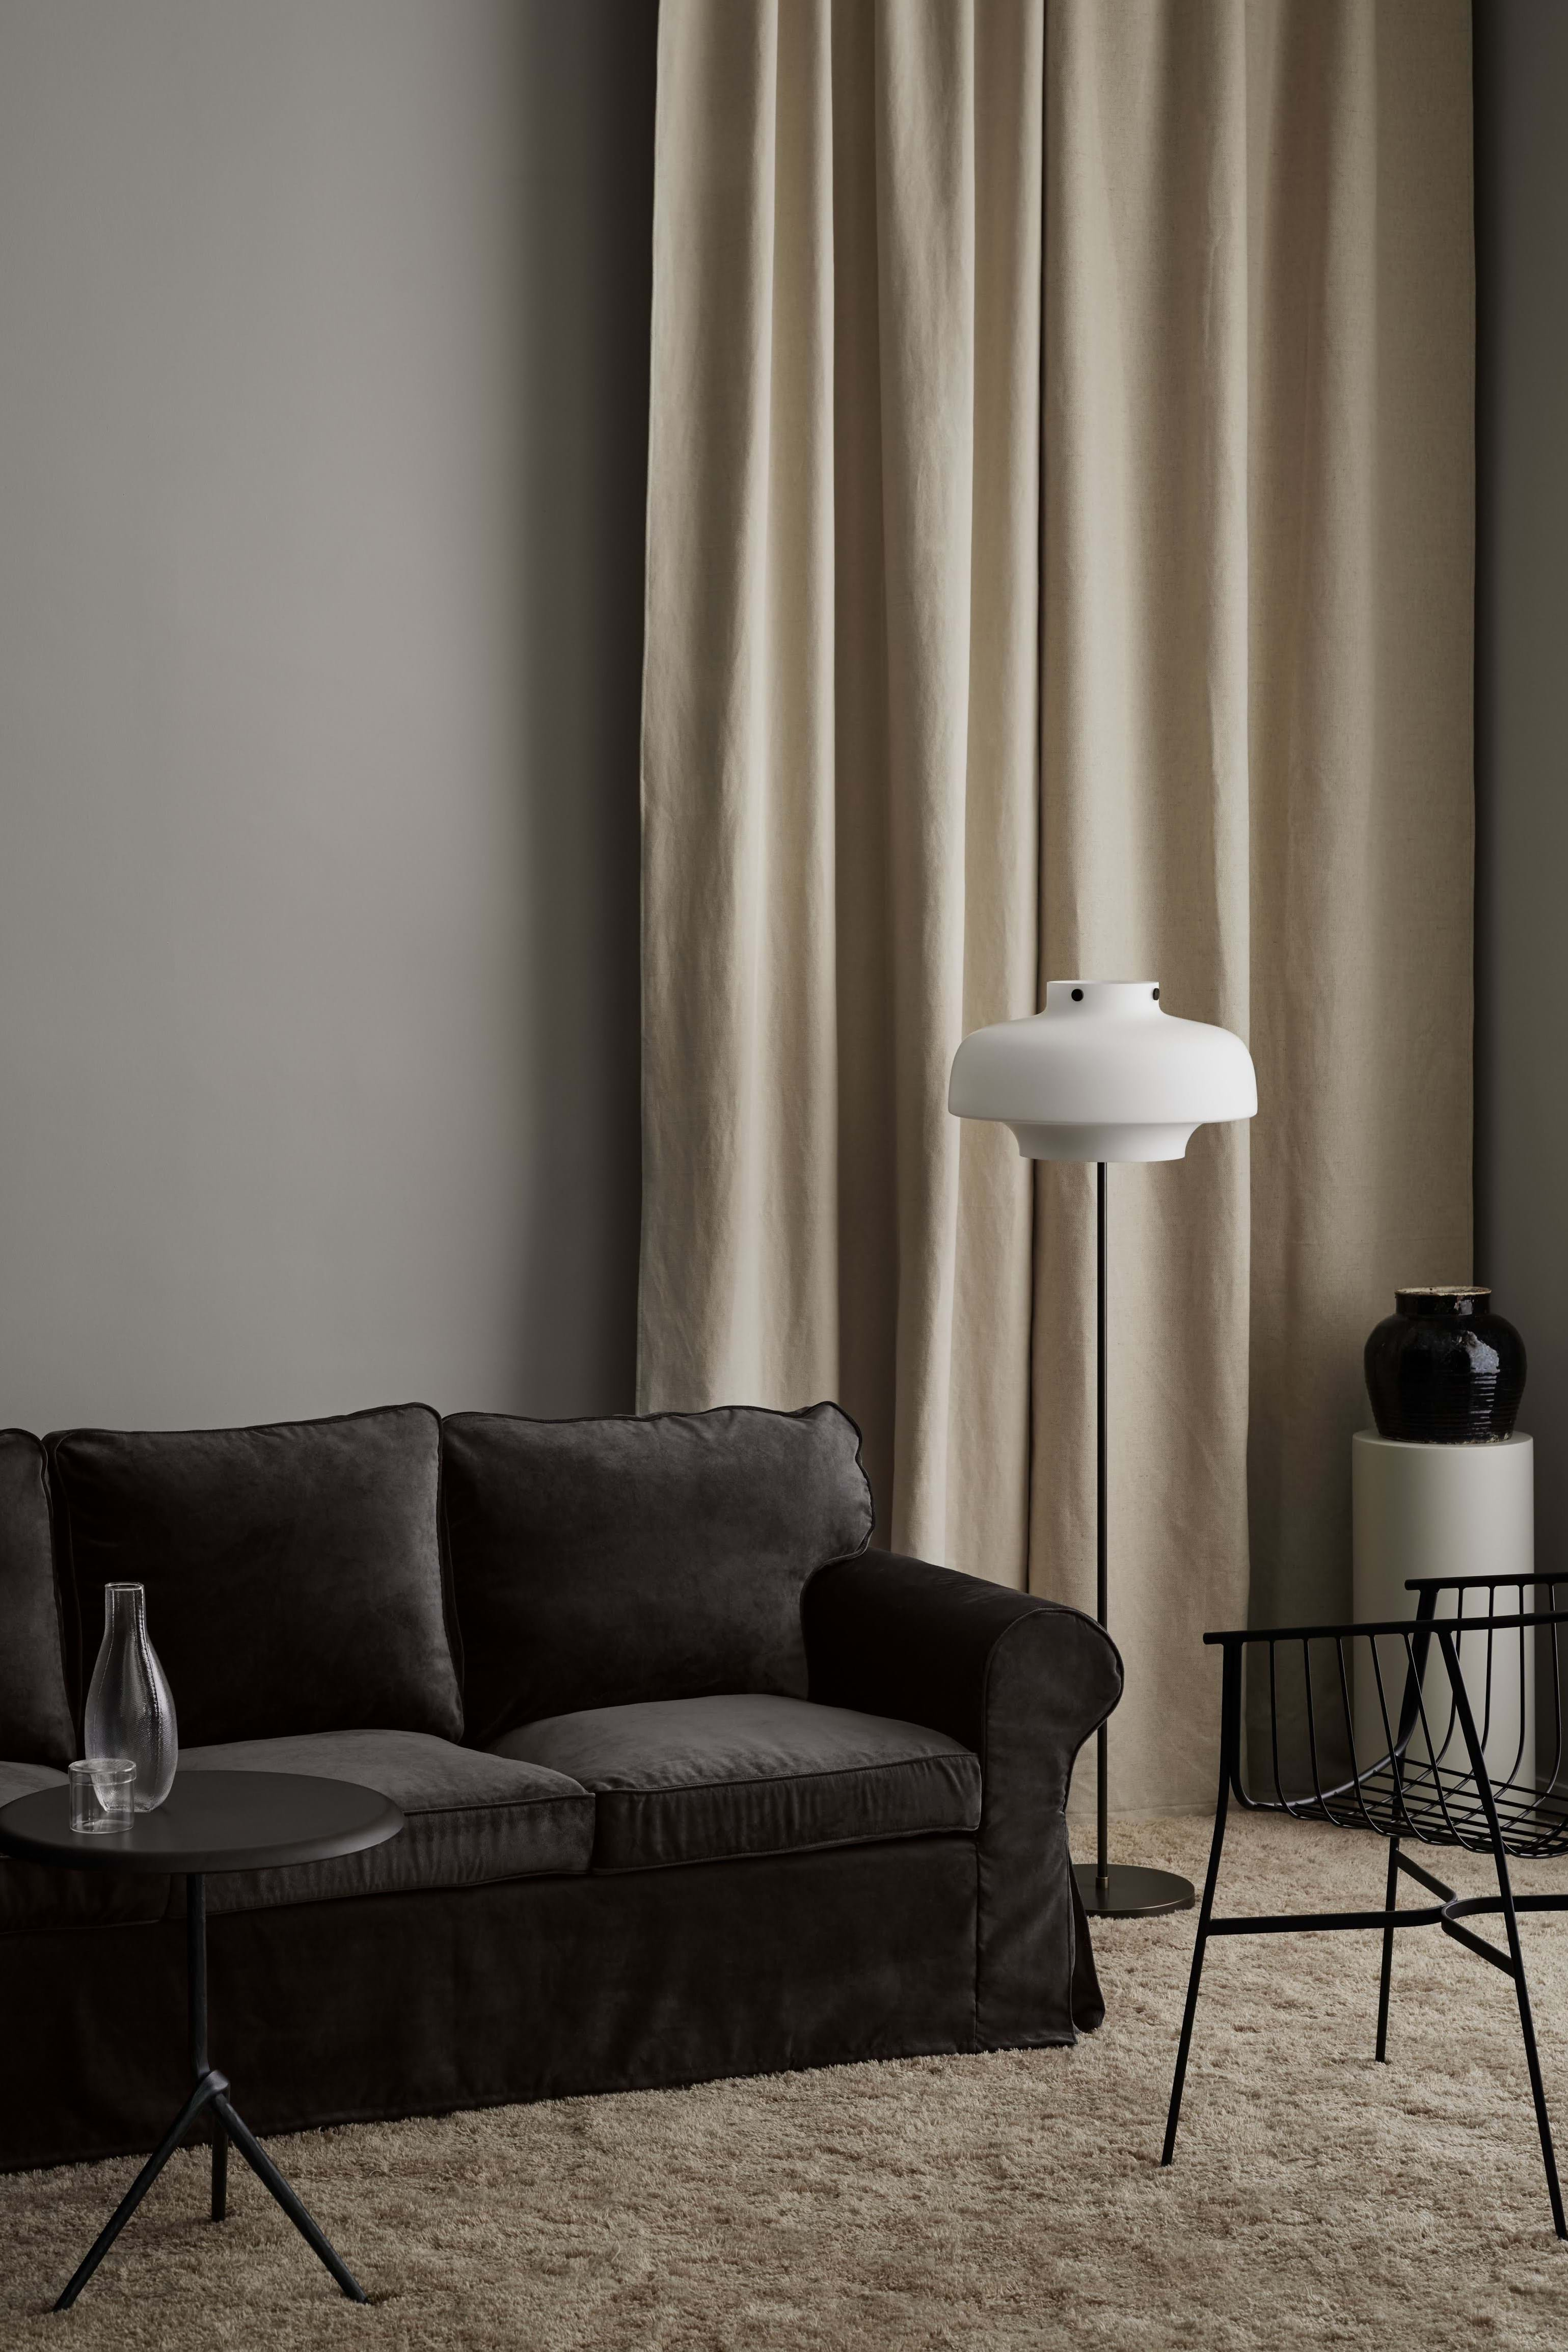 IKEA Ektorp soffa översikt by Bemz | Bemz